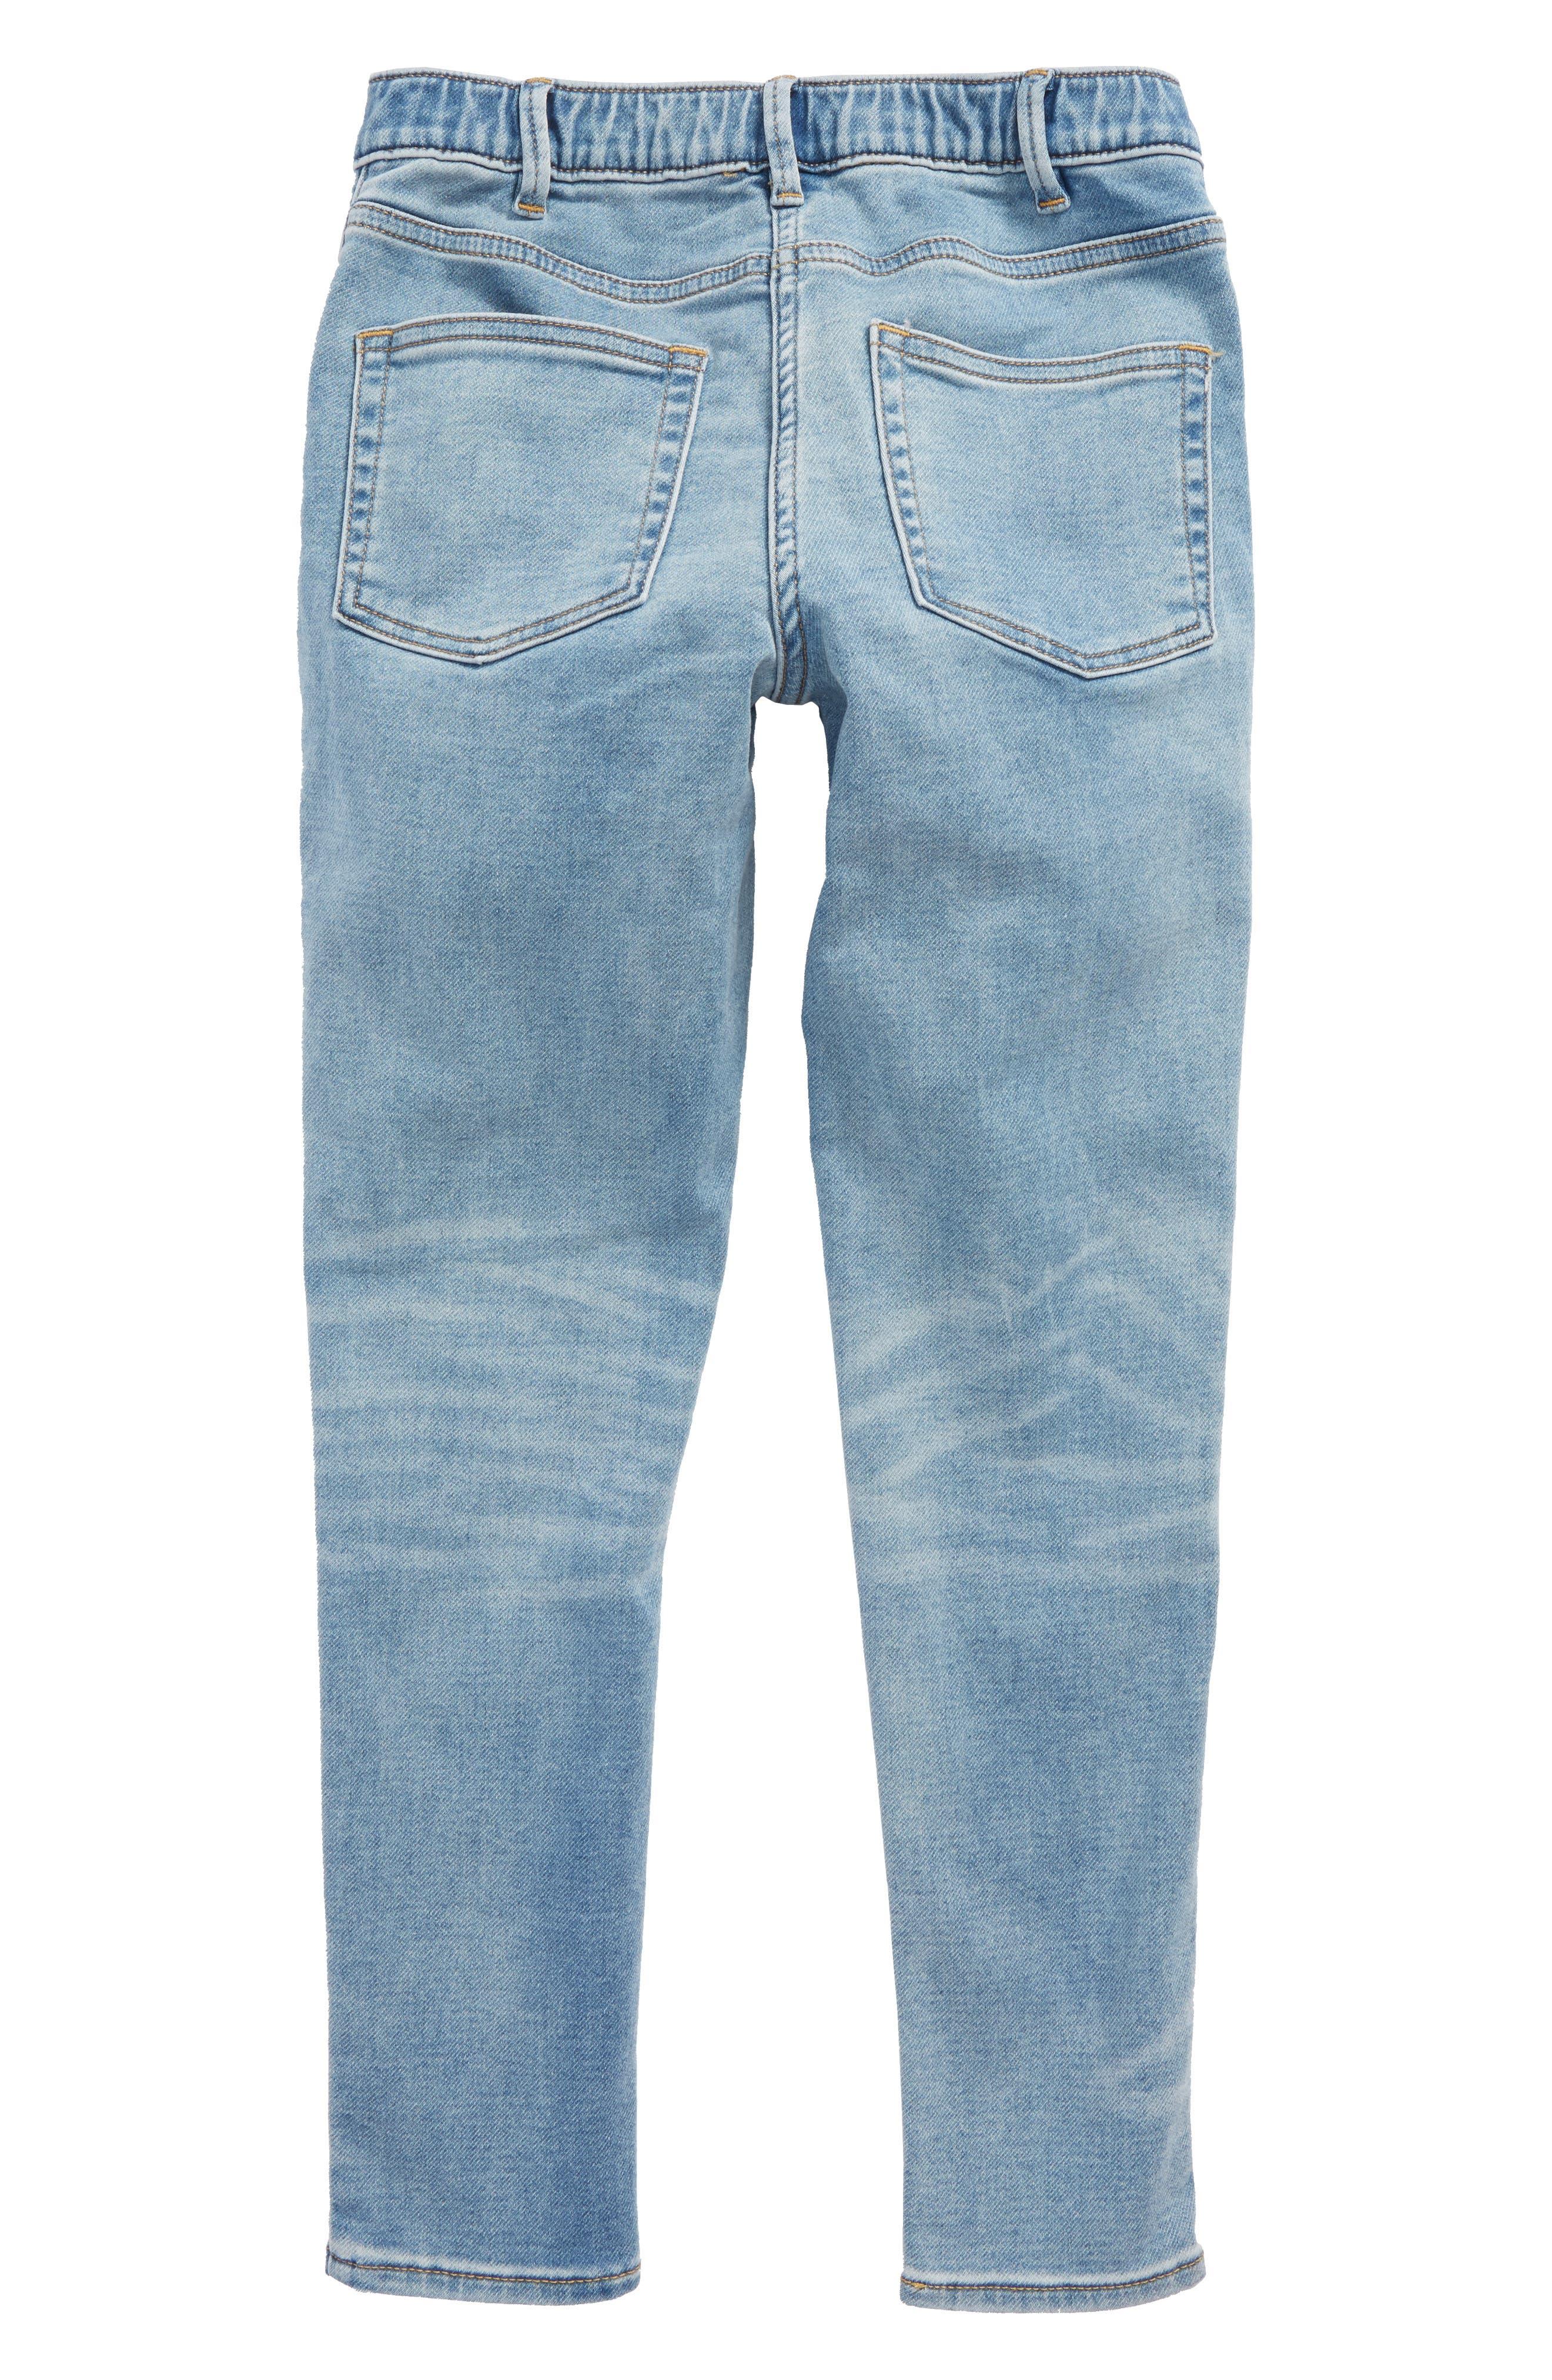 Runaround Stretch Denim Jeans,                             Alternate thumbnail 2, color,                             PATCHWORK WASH